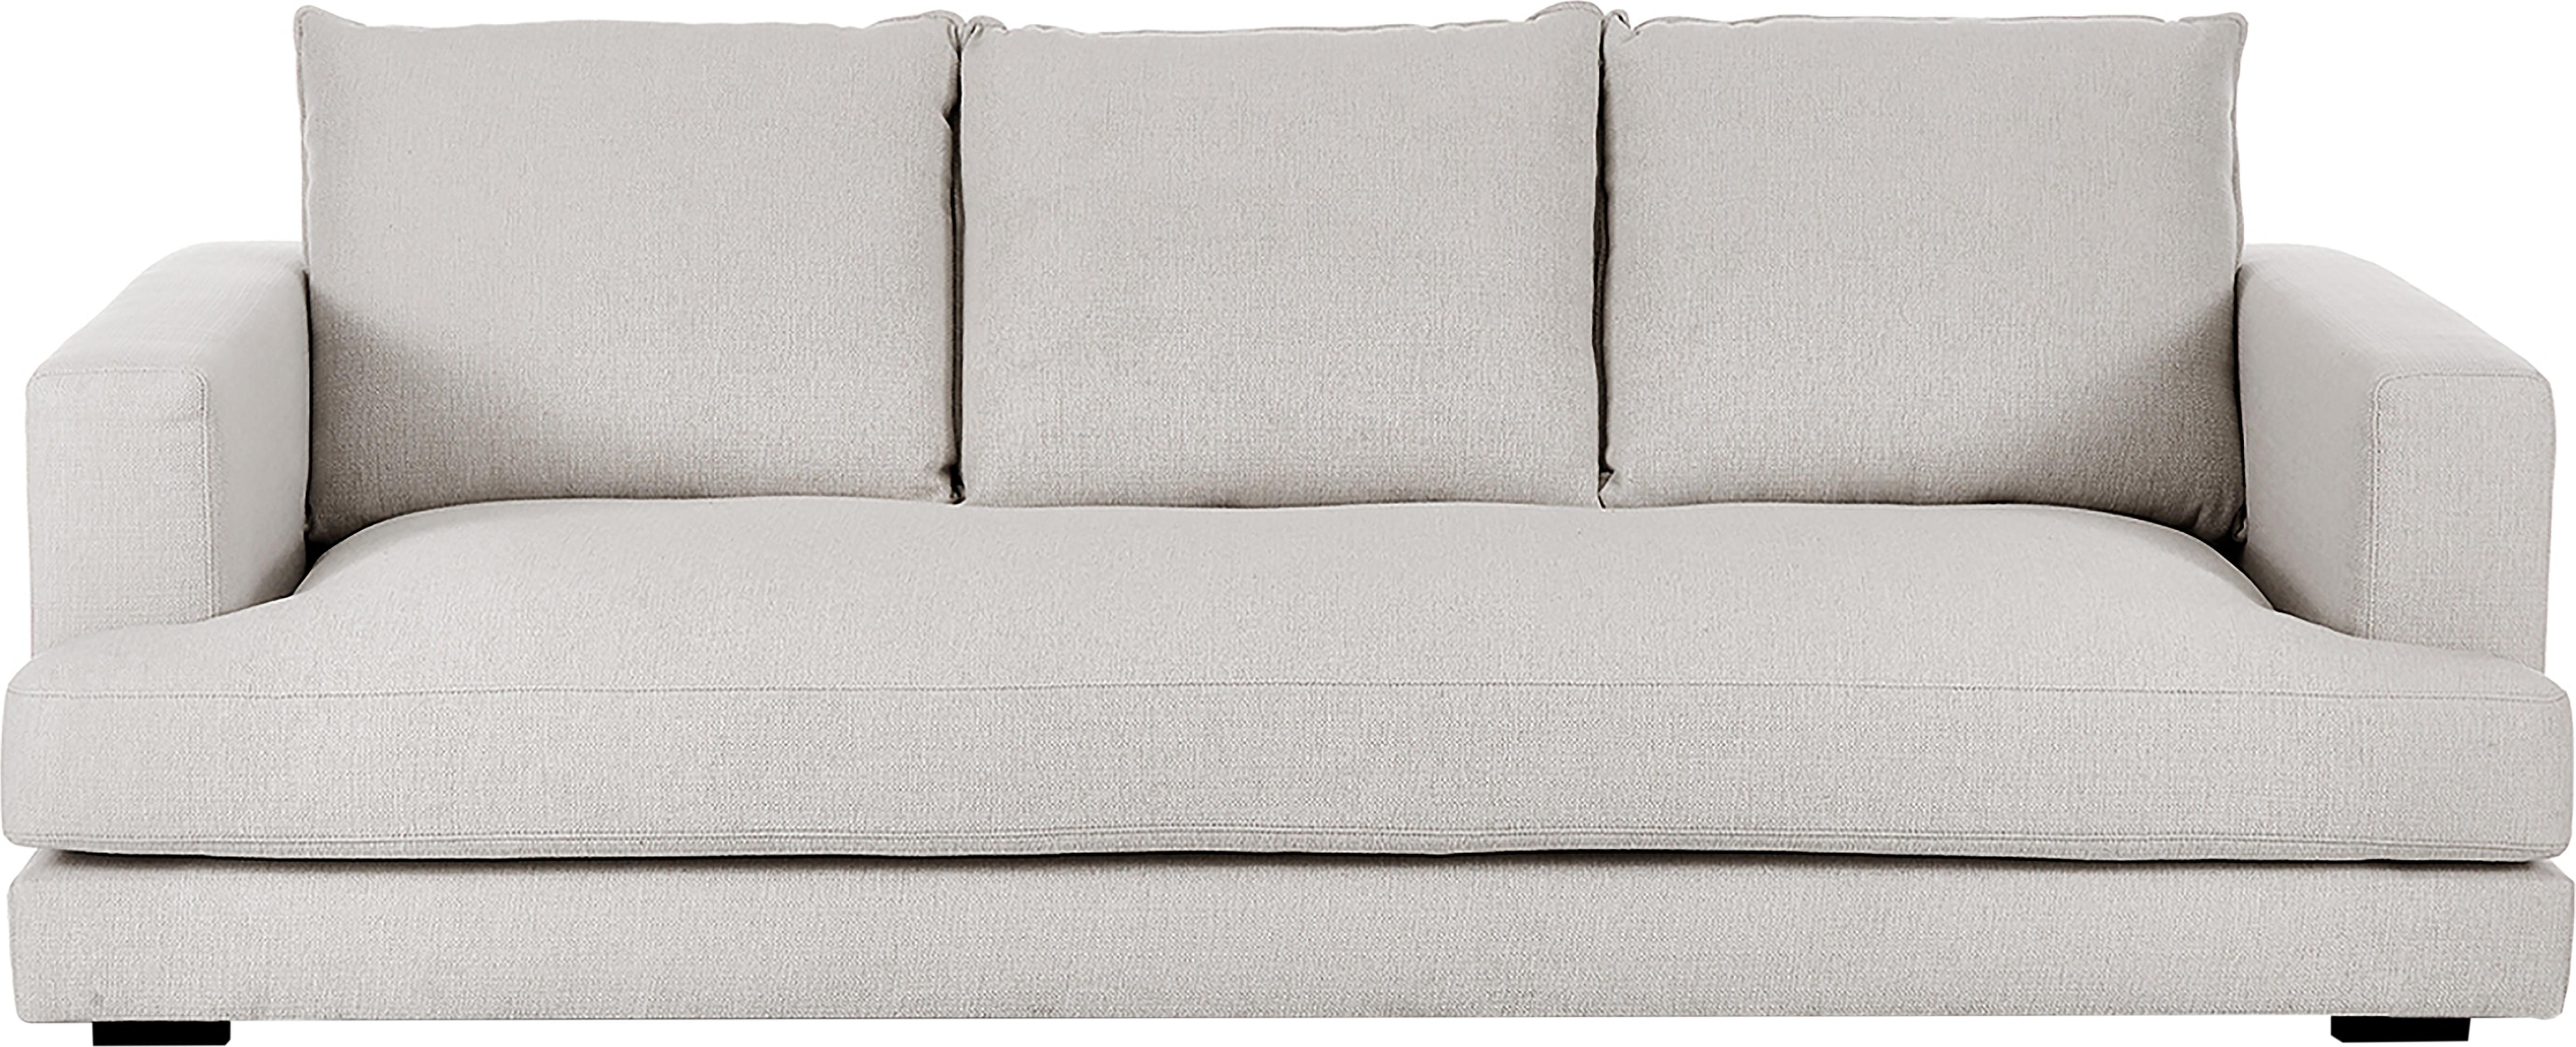 Sofa Tribeca (3-Sitzer), Bezug: Polyester Der hochwertige, Gestell: Massives Kiefernholz, Webstoff Beigegrau, B 228 x T 104 cm